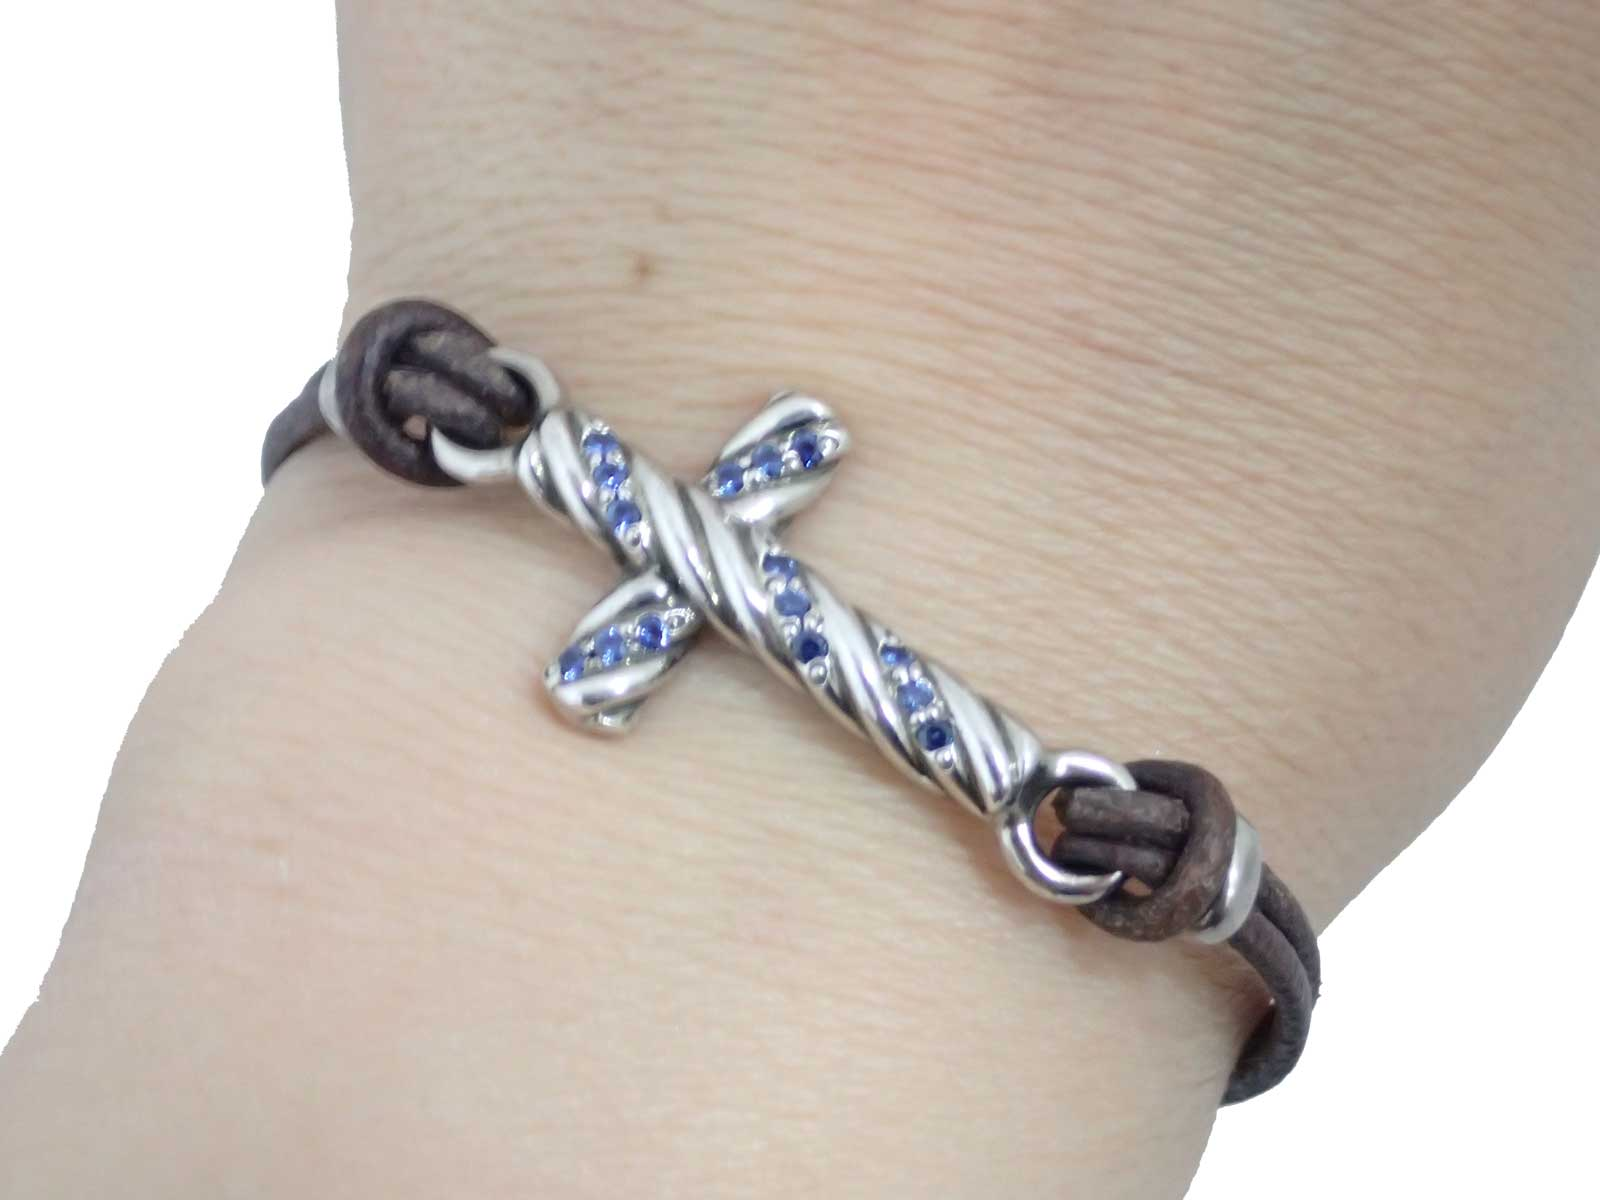 2ba72680e Auth Gucci Cross Charm Motif Bangle Bracelet Brown/Blue/Silvertone -  e40633. Item Photos